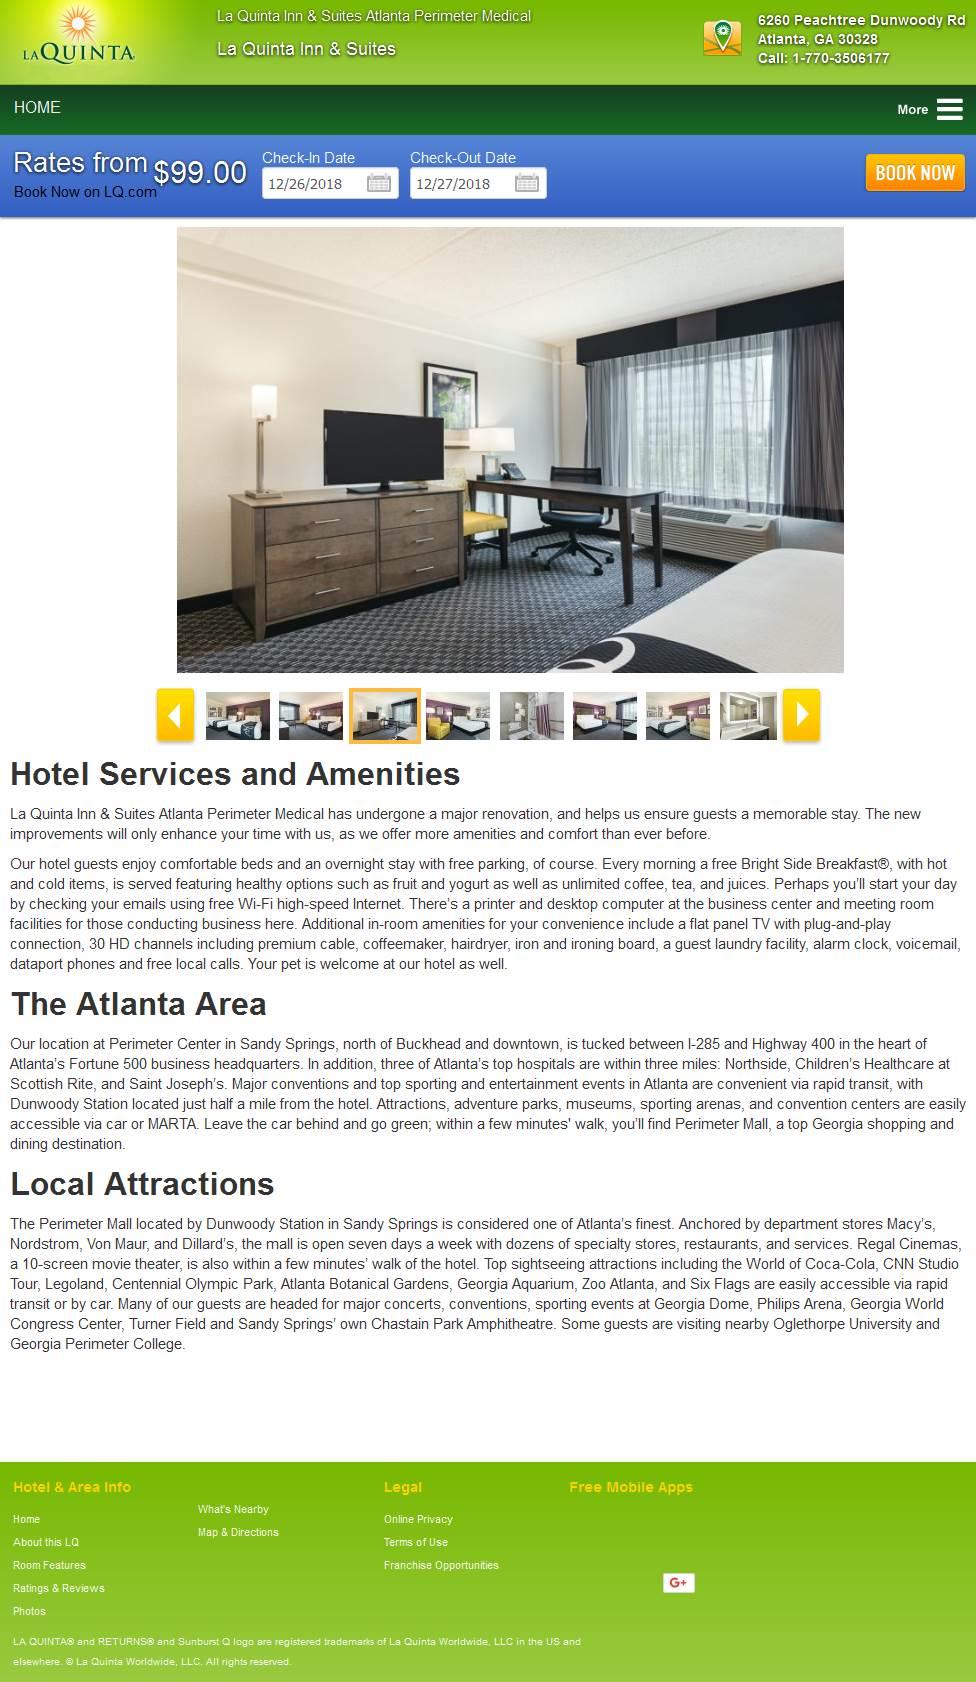 La Quinta Inn & Suites Atlanta Perimeter Medical